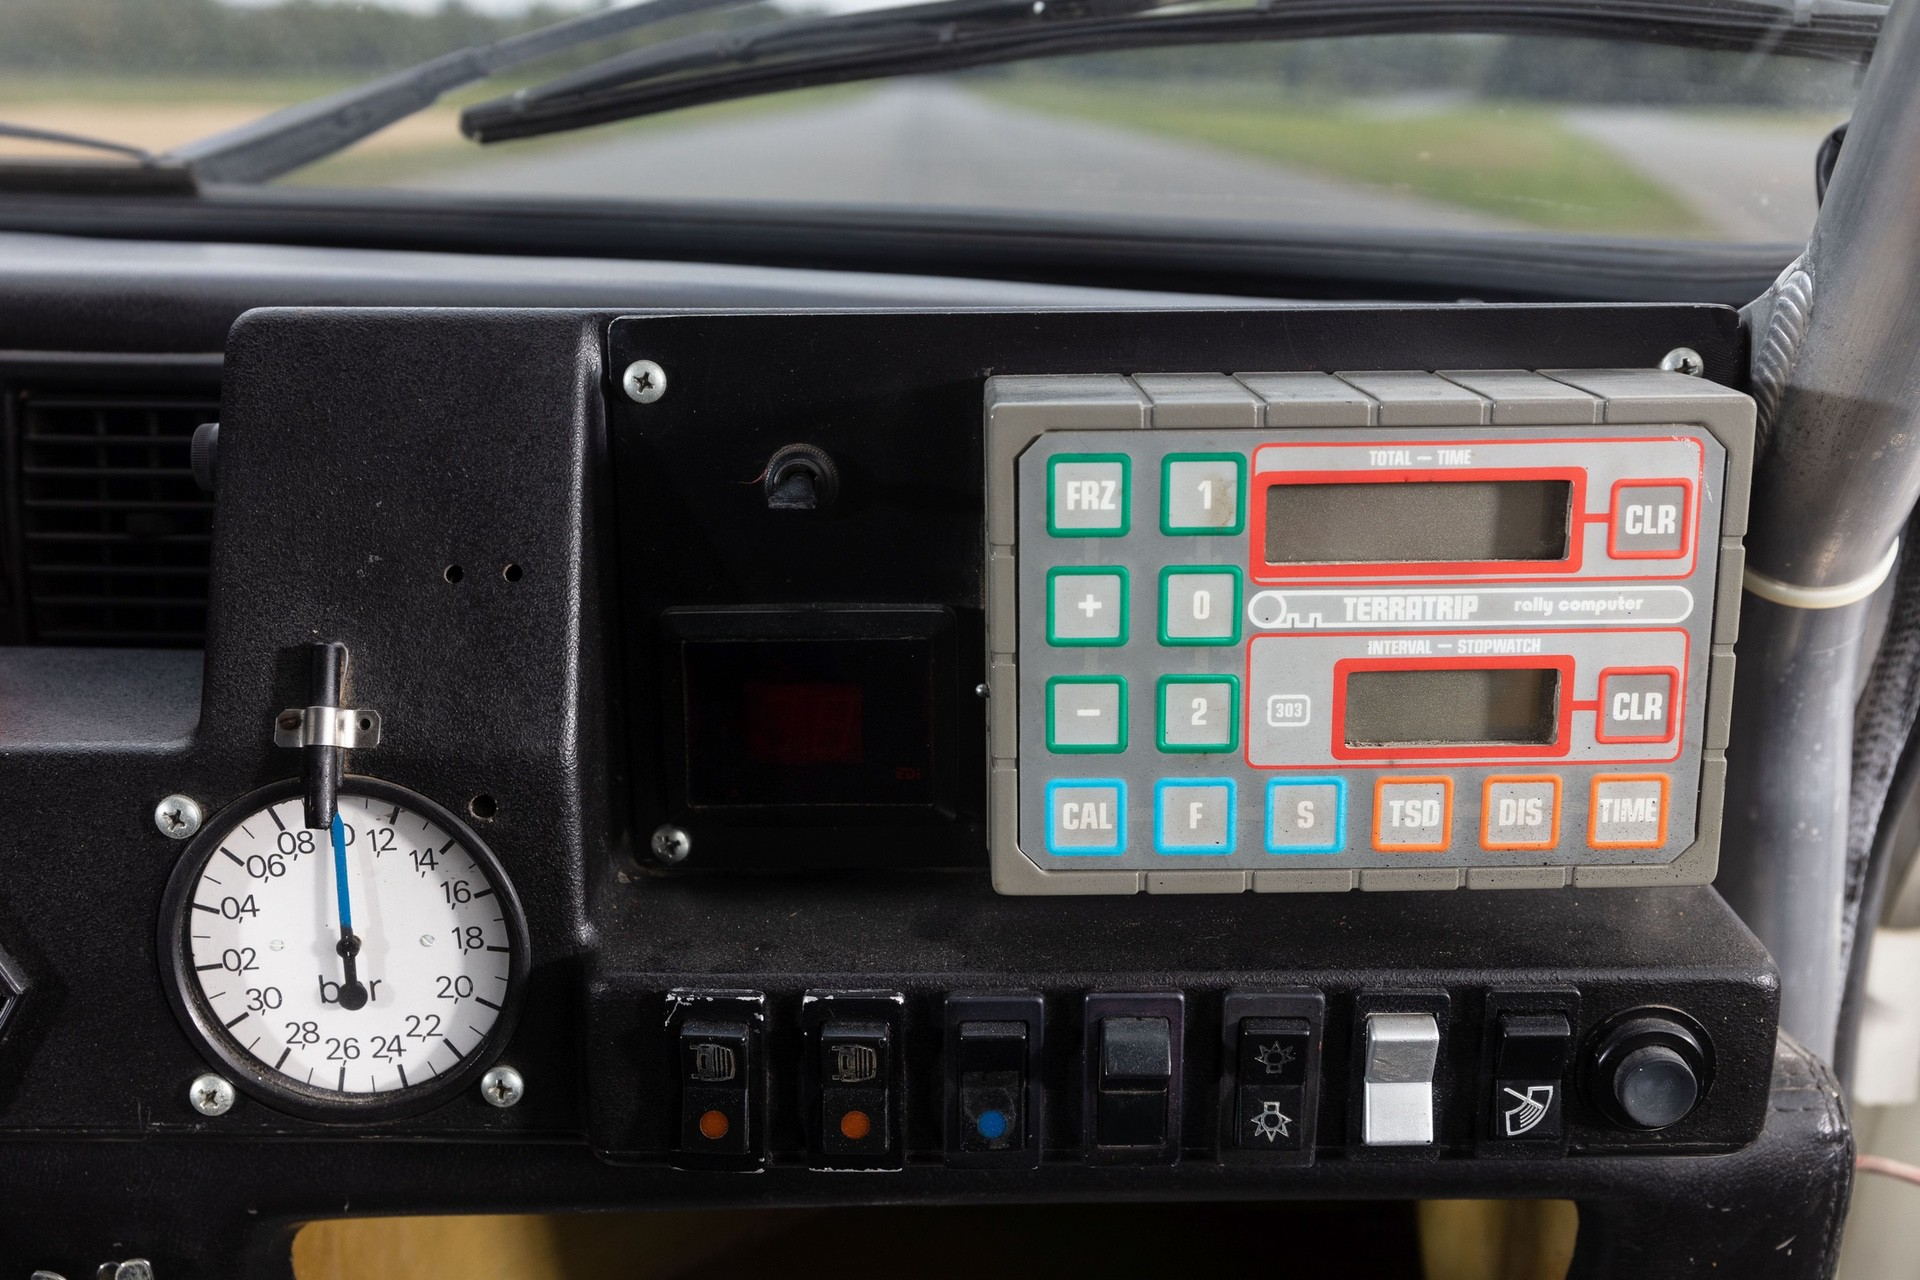 Renault_R5_Maxi_Turbo_ex-Carlos_Sainz-0023